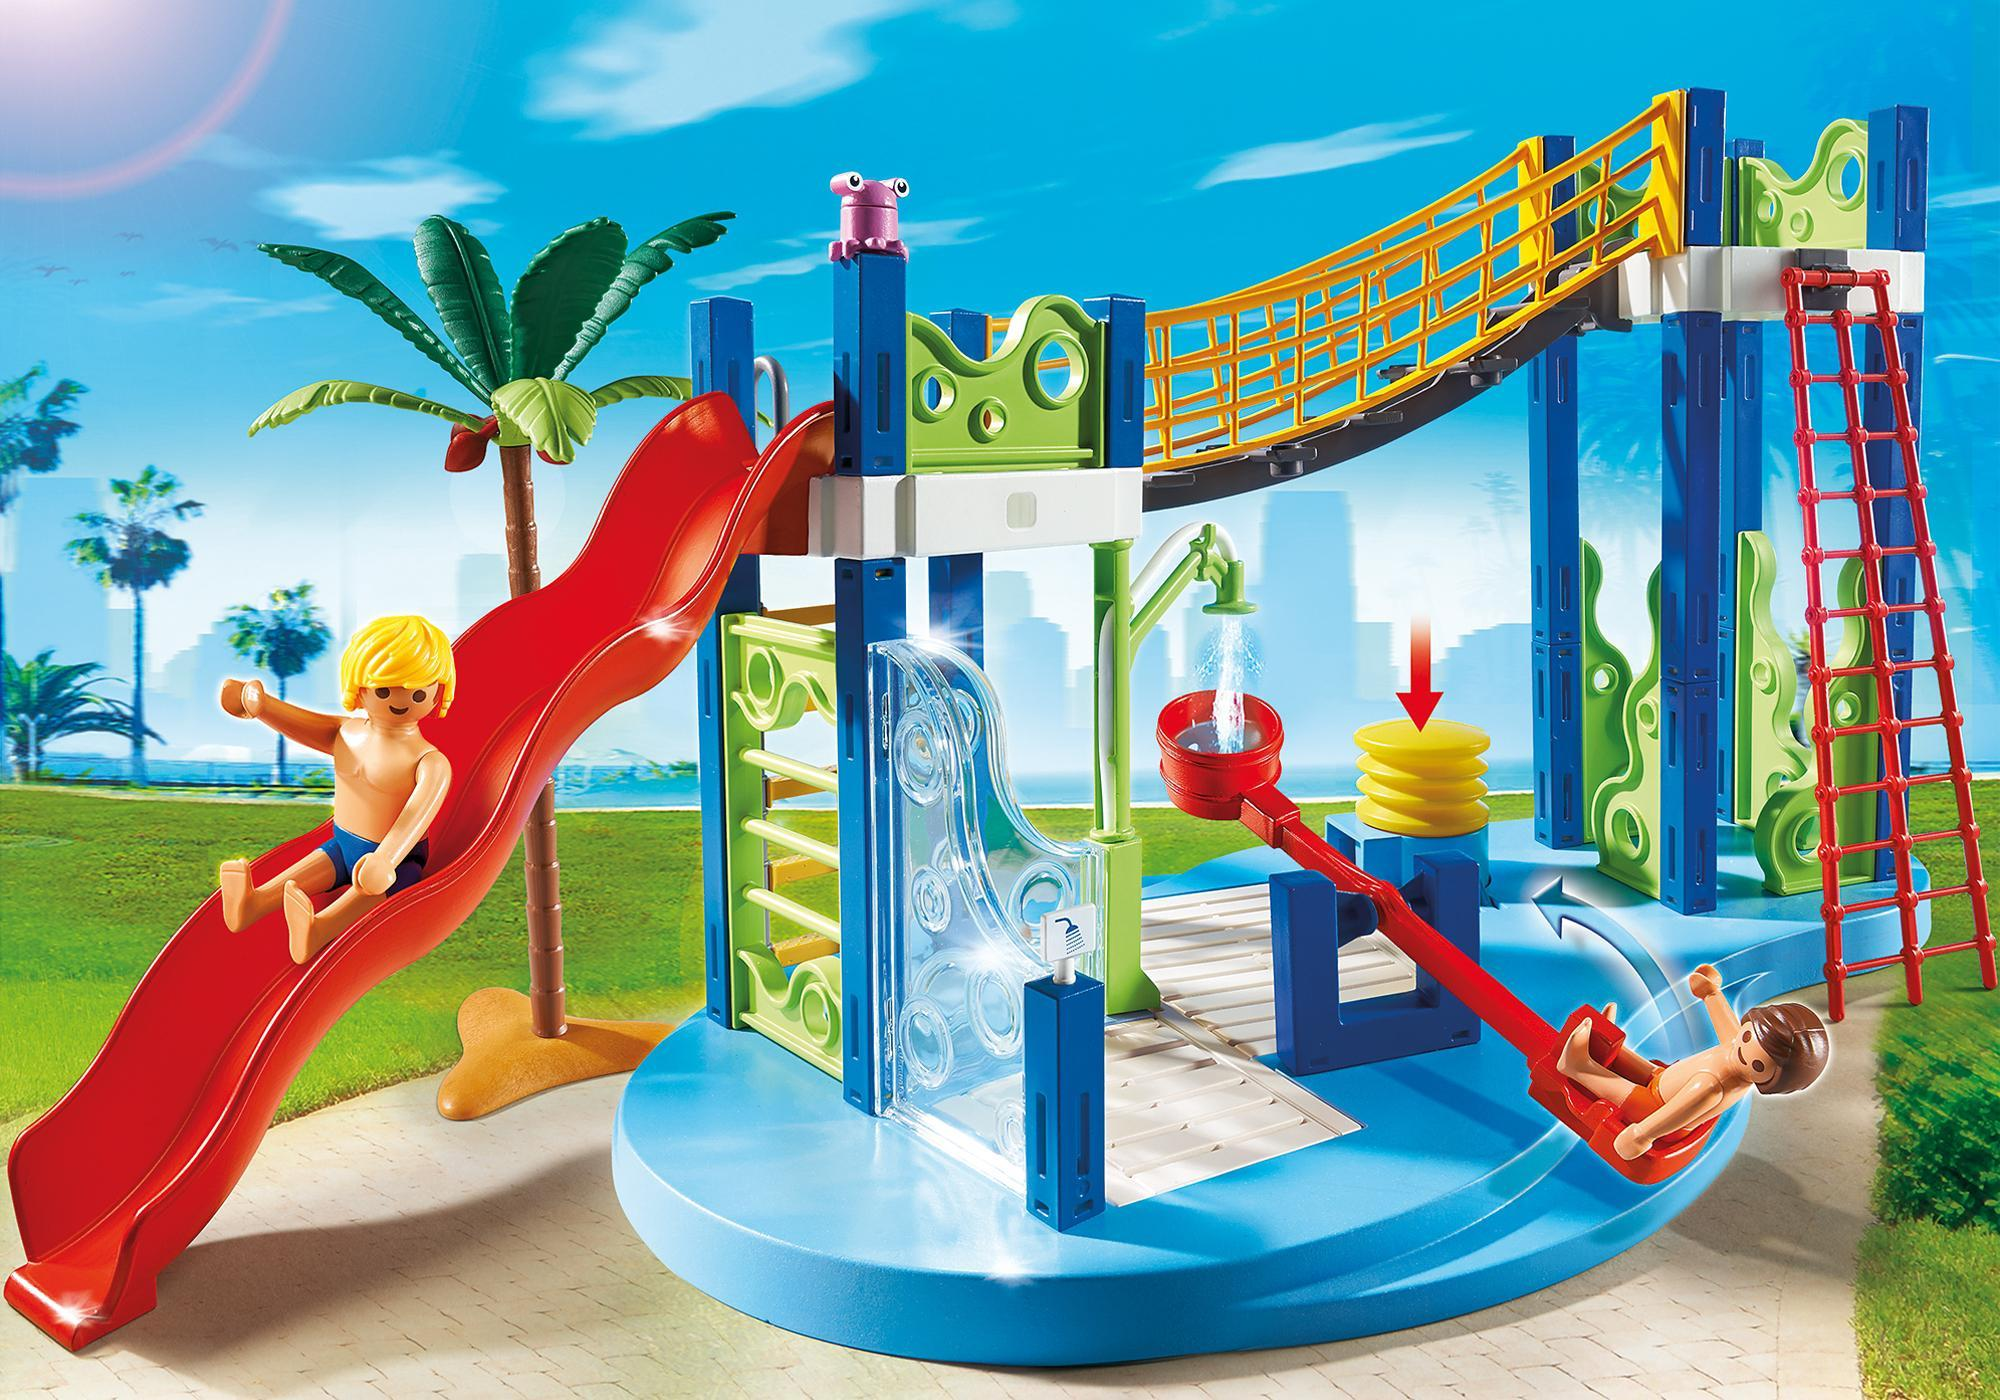 http://media.playmobil.com/i/playmobil/6670_product_detail/Wasserspielplatz